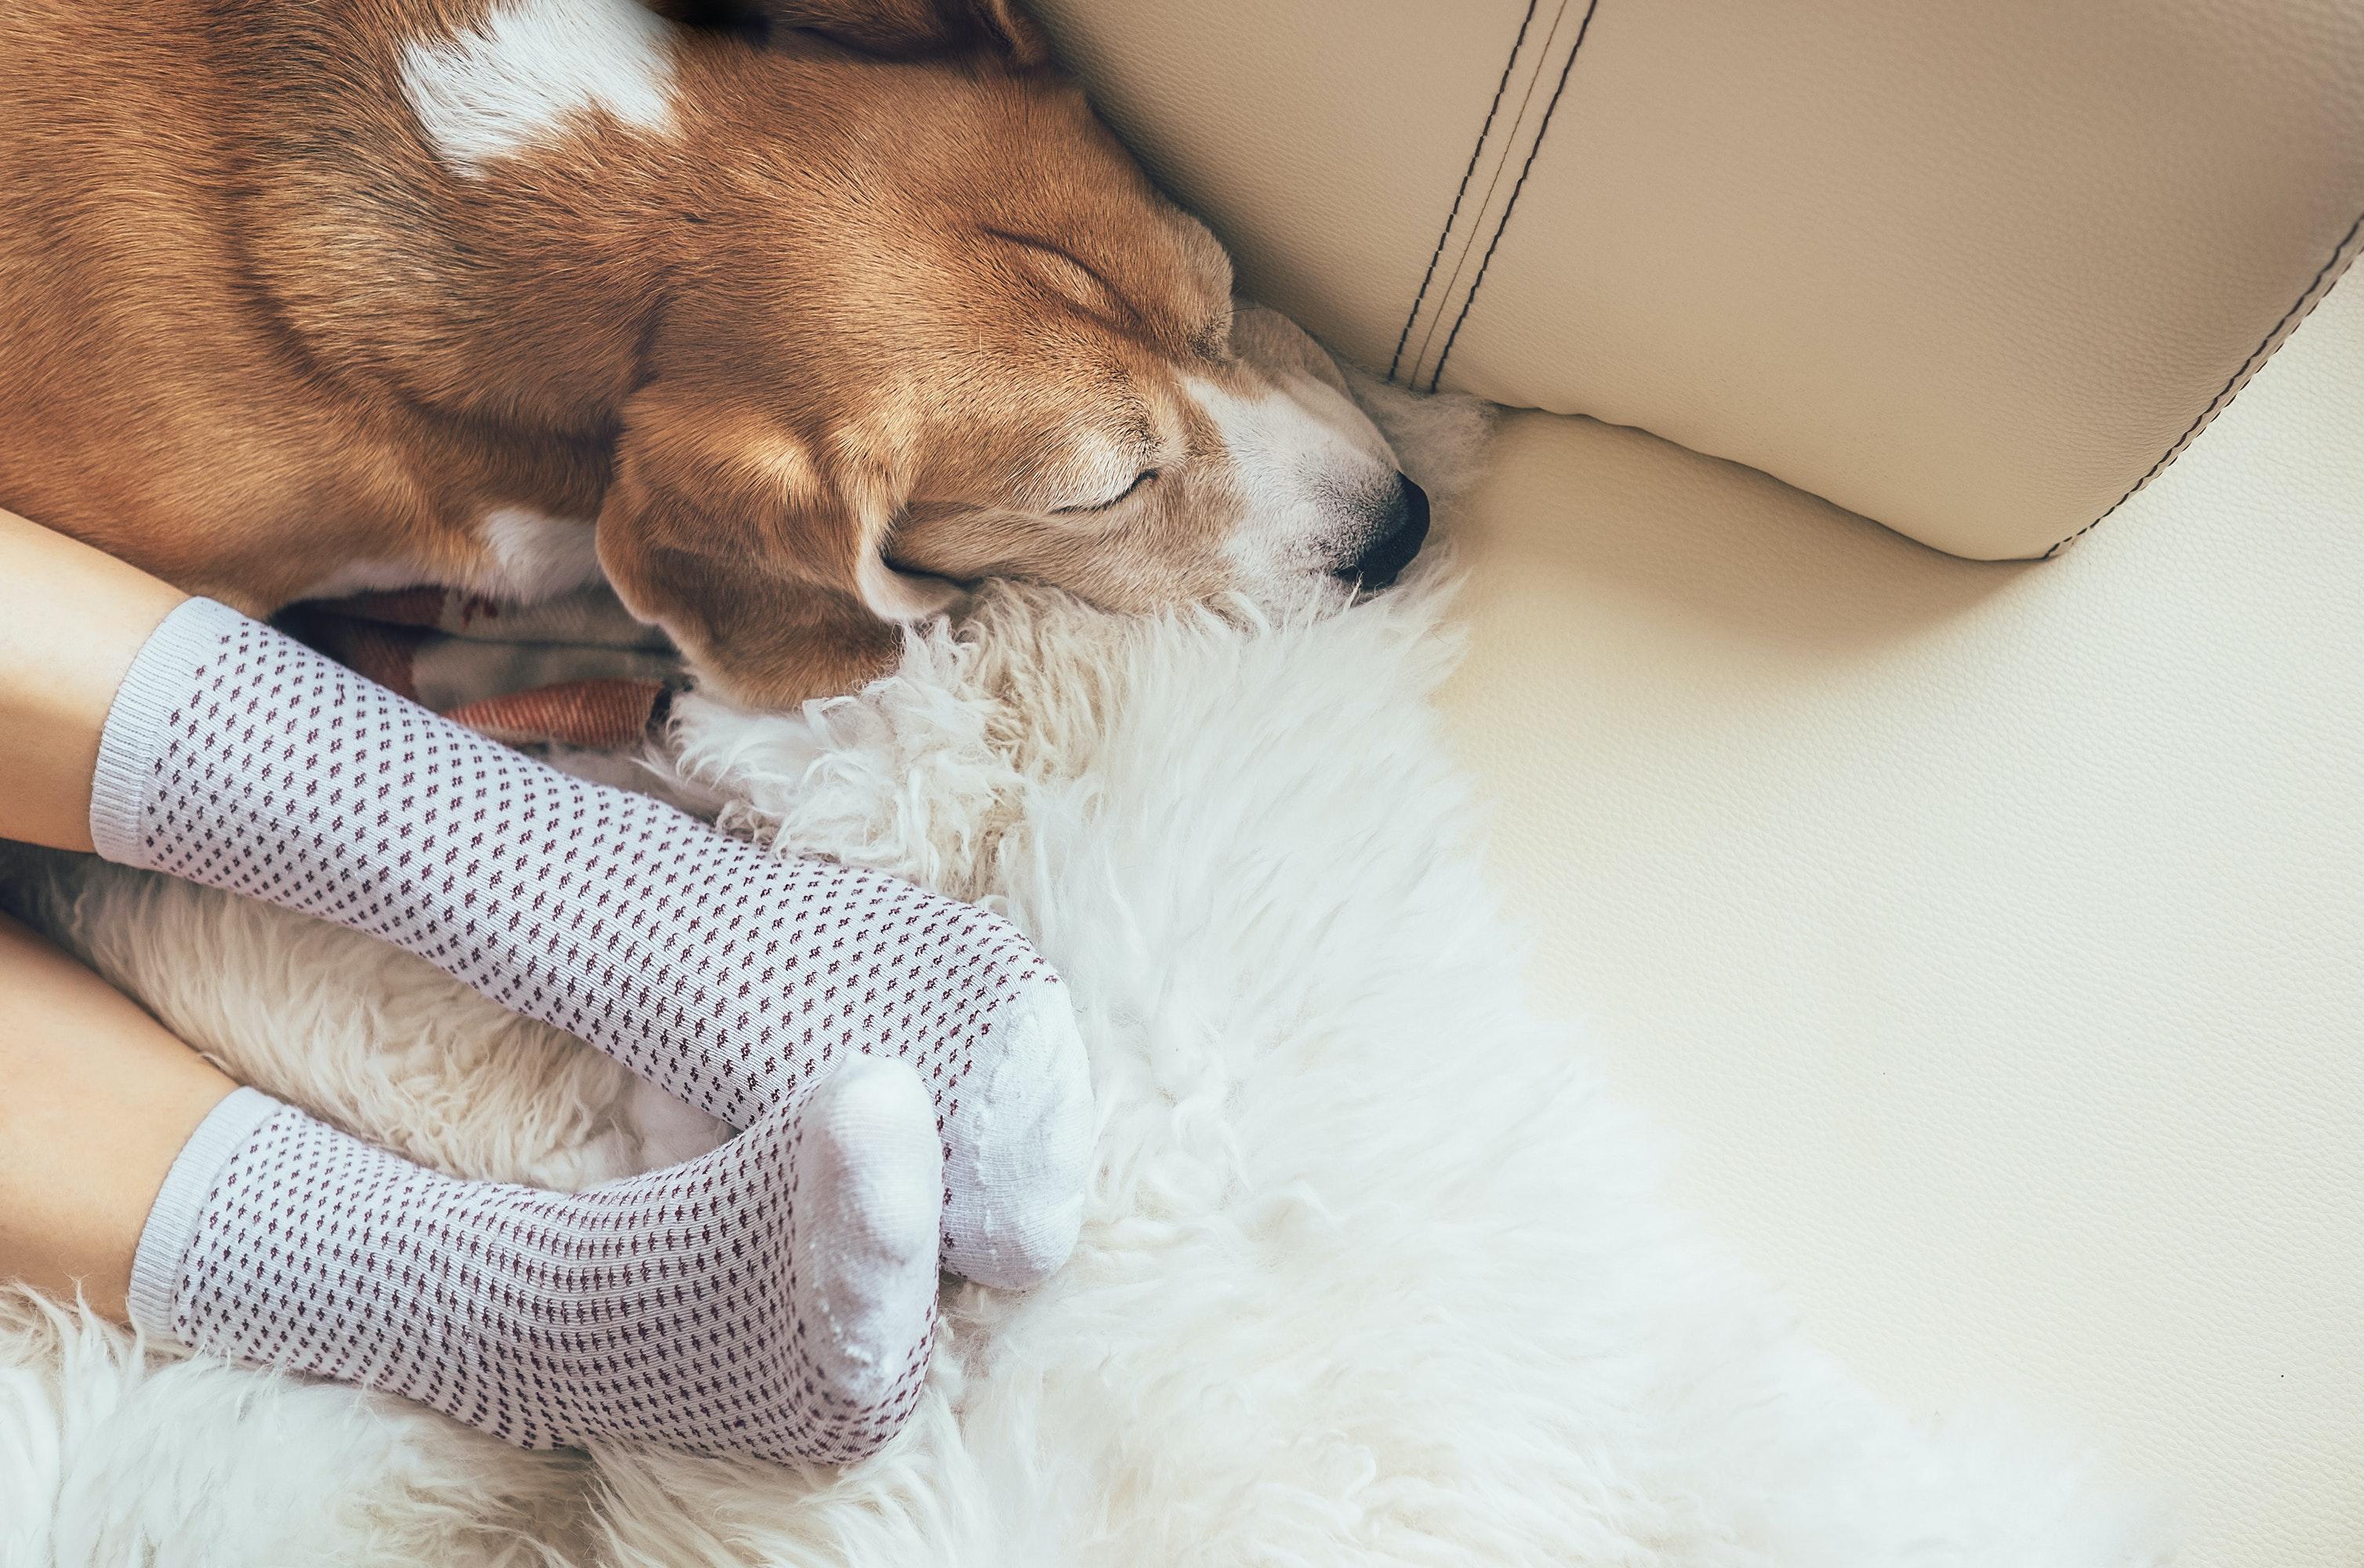 Warm home with dog